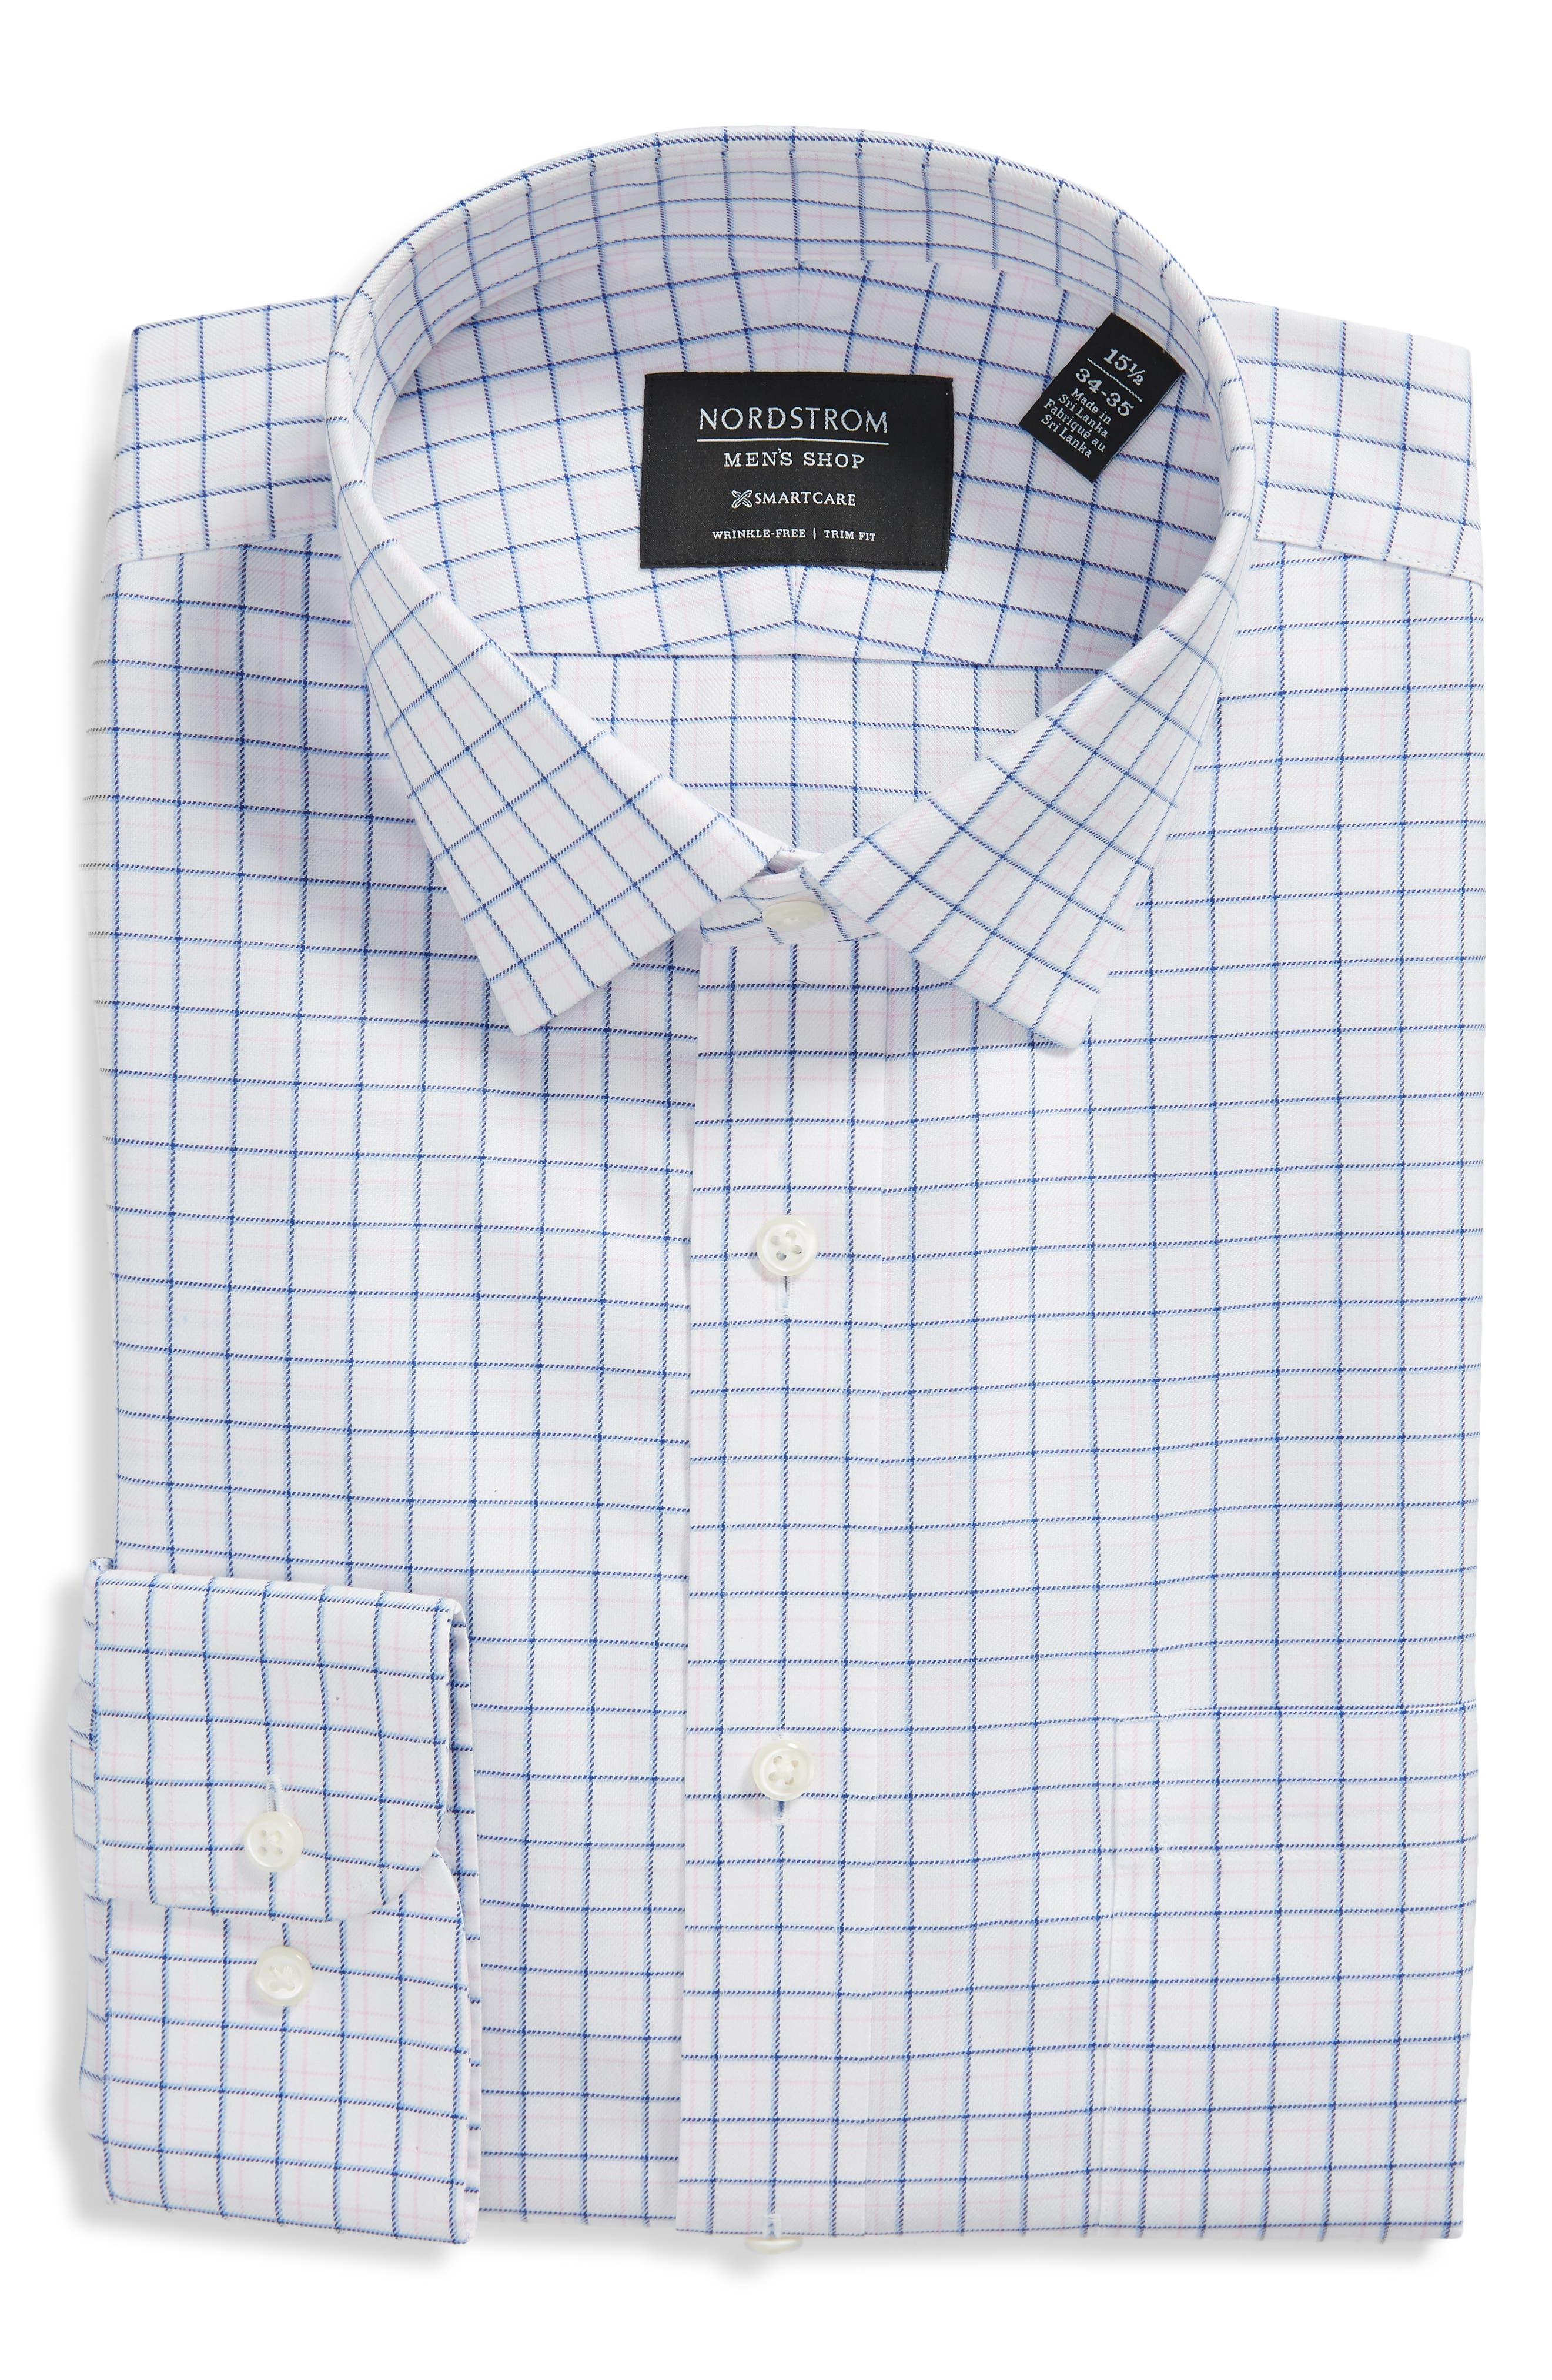 Image of NORDSTROM MEN'S SHOP Trim Fit Check Dress Shirt